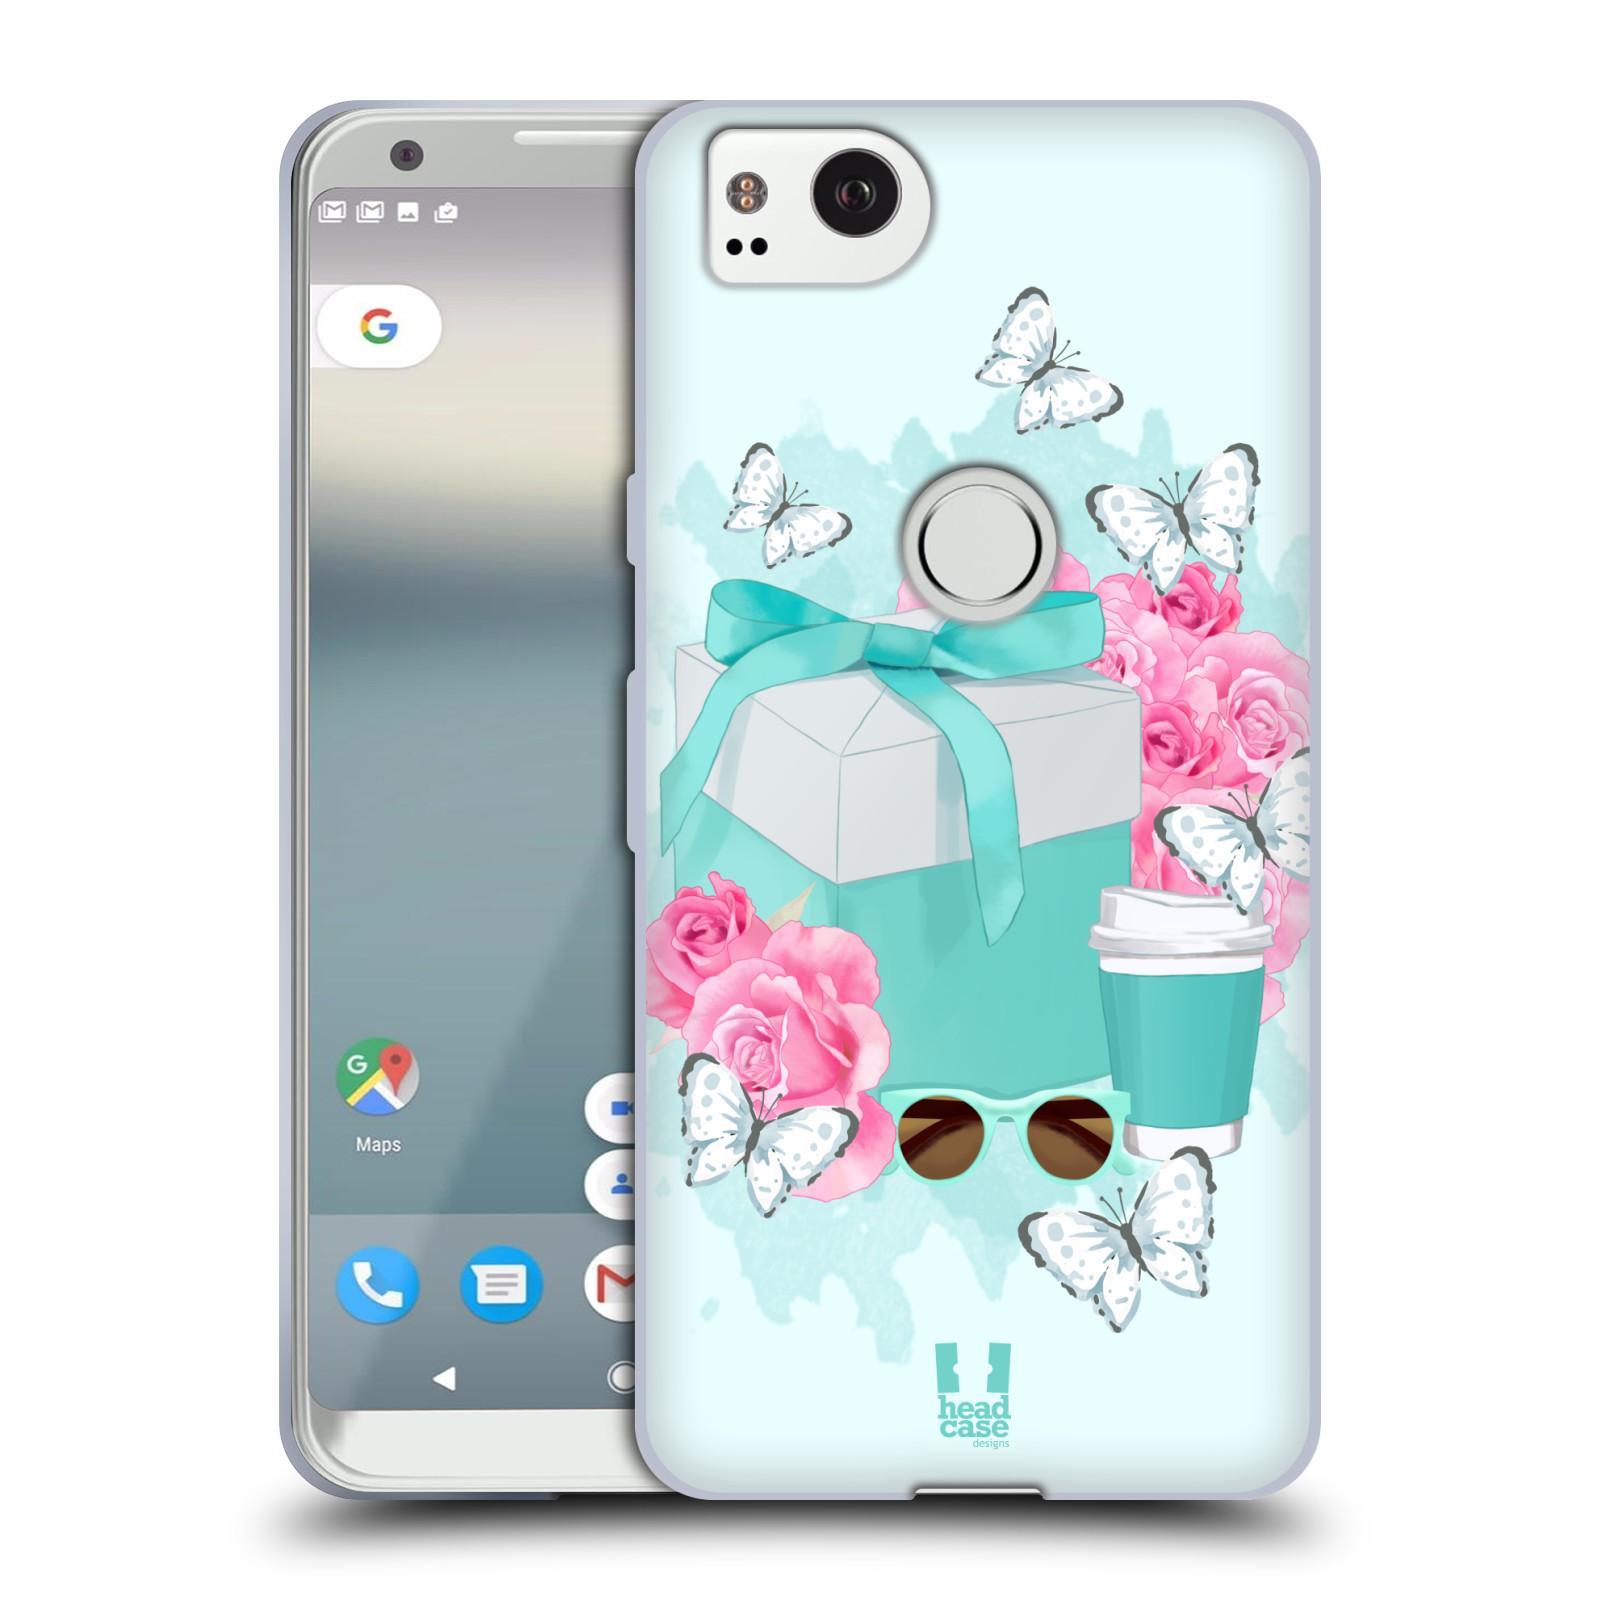 COVER-HEAD-CASE-DESIGNS-Vanity-Collection-Soft-Gel-Custodia-per-Amazon-ASUS-OnePlus